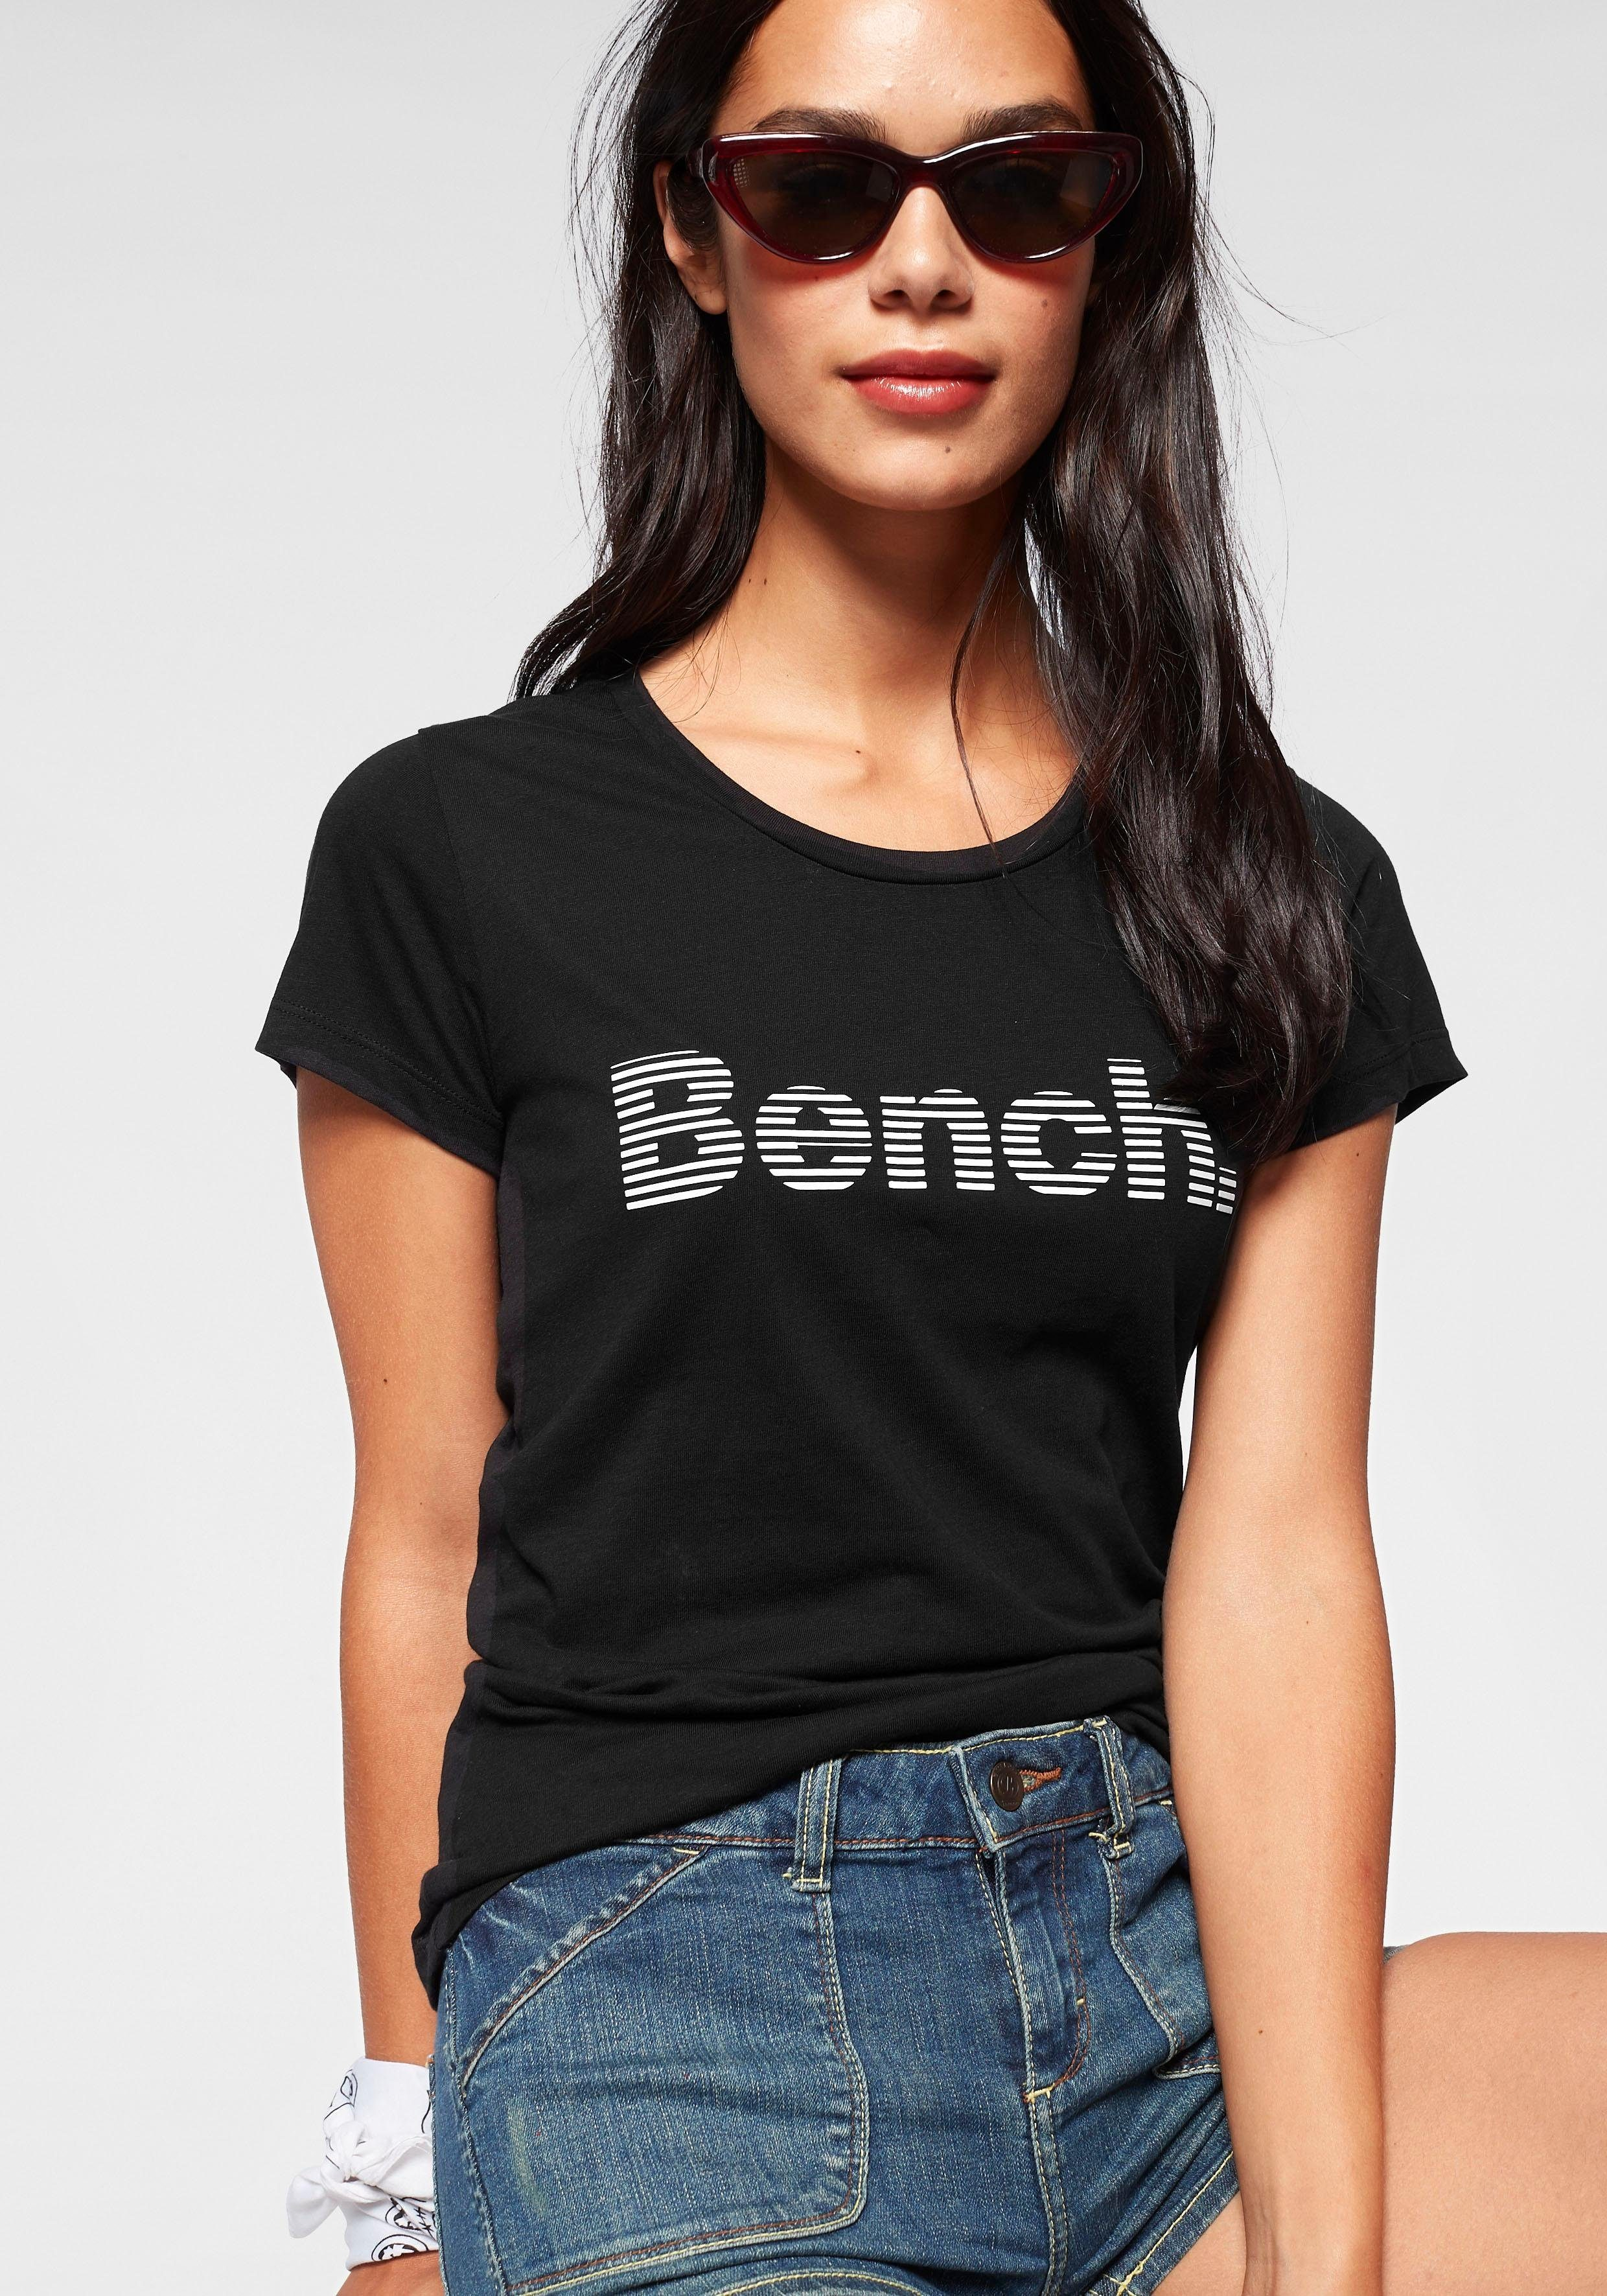 Tom Tailor Denim Damen Shirt Blusen-Top Rundhalsshirt Kurzarmshirt Halbarm Mode